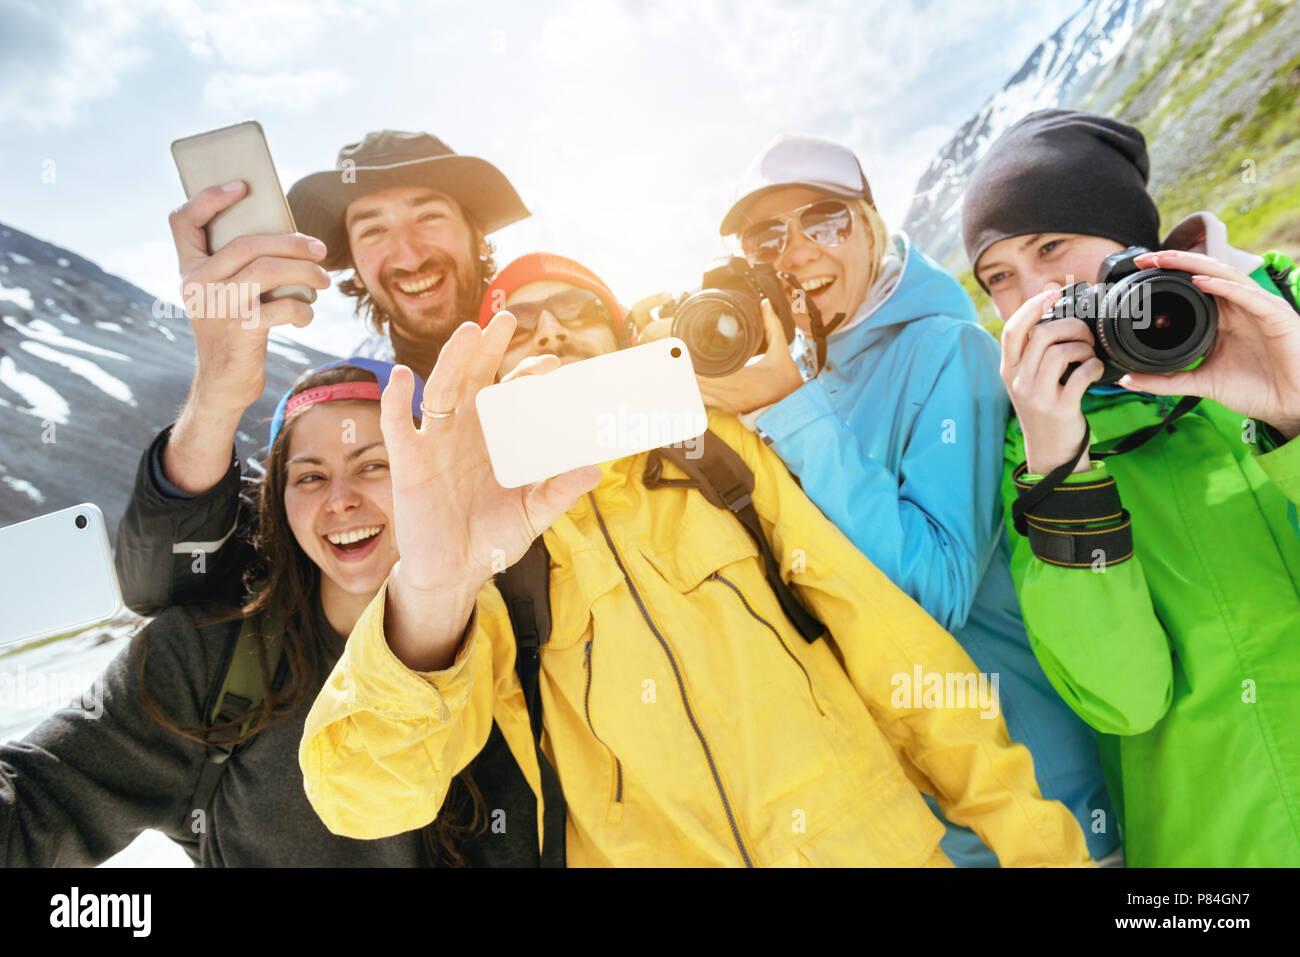 Grupo feliz amigos turistas foto selfie Imagen De Stock